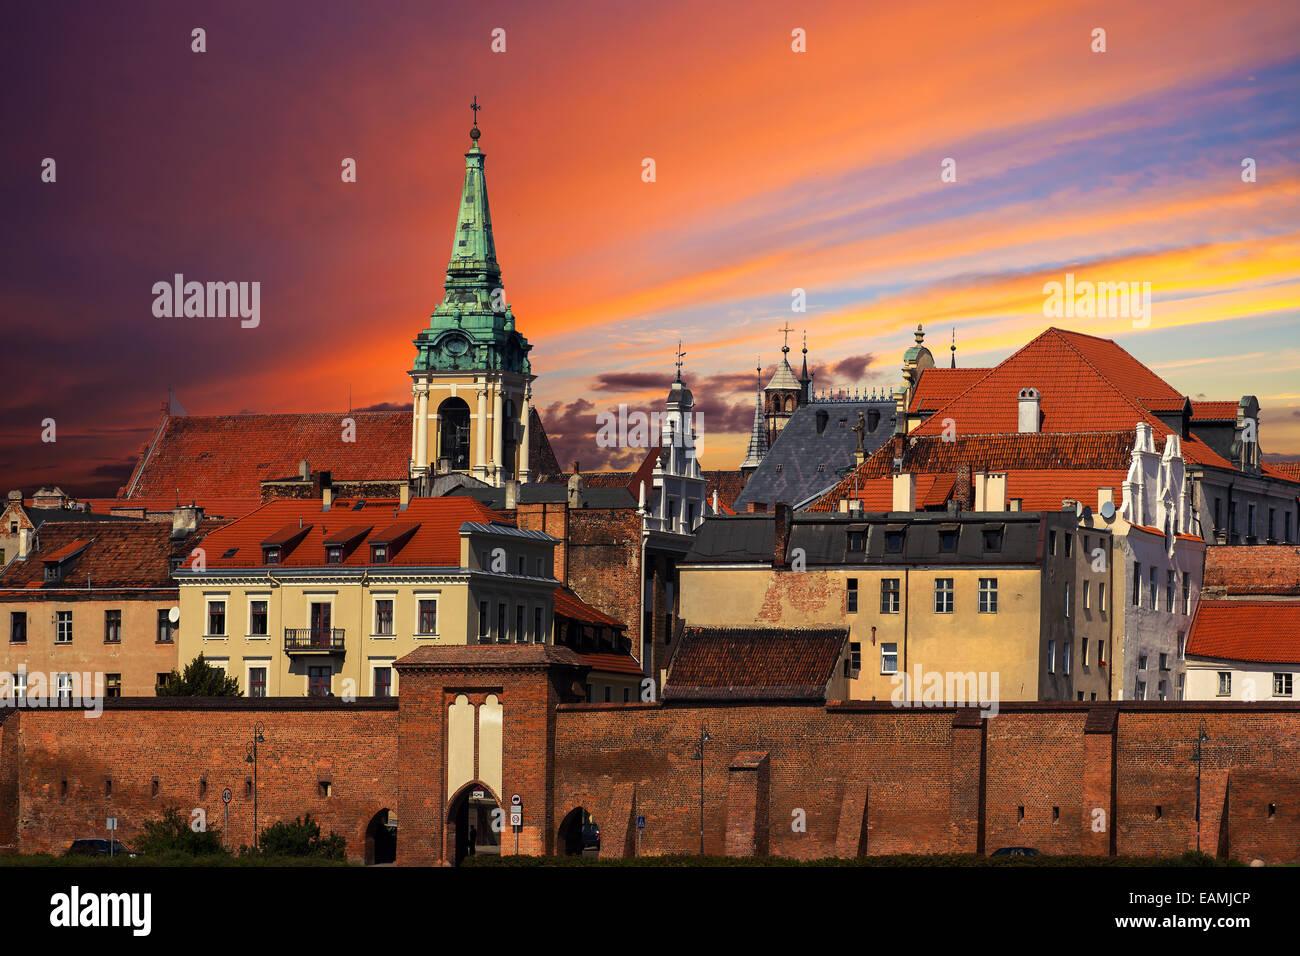 Sunset over old town of Torun, Poland. - Stock Image